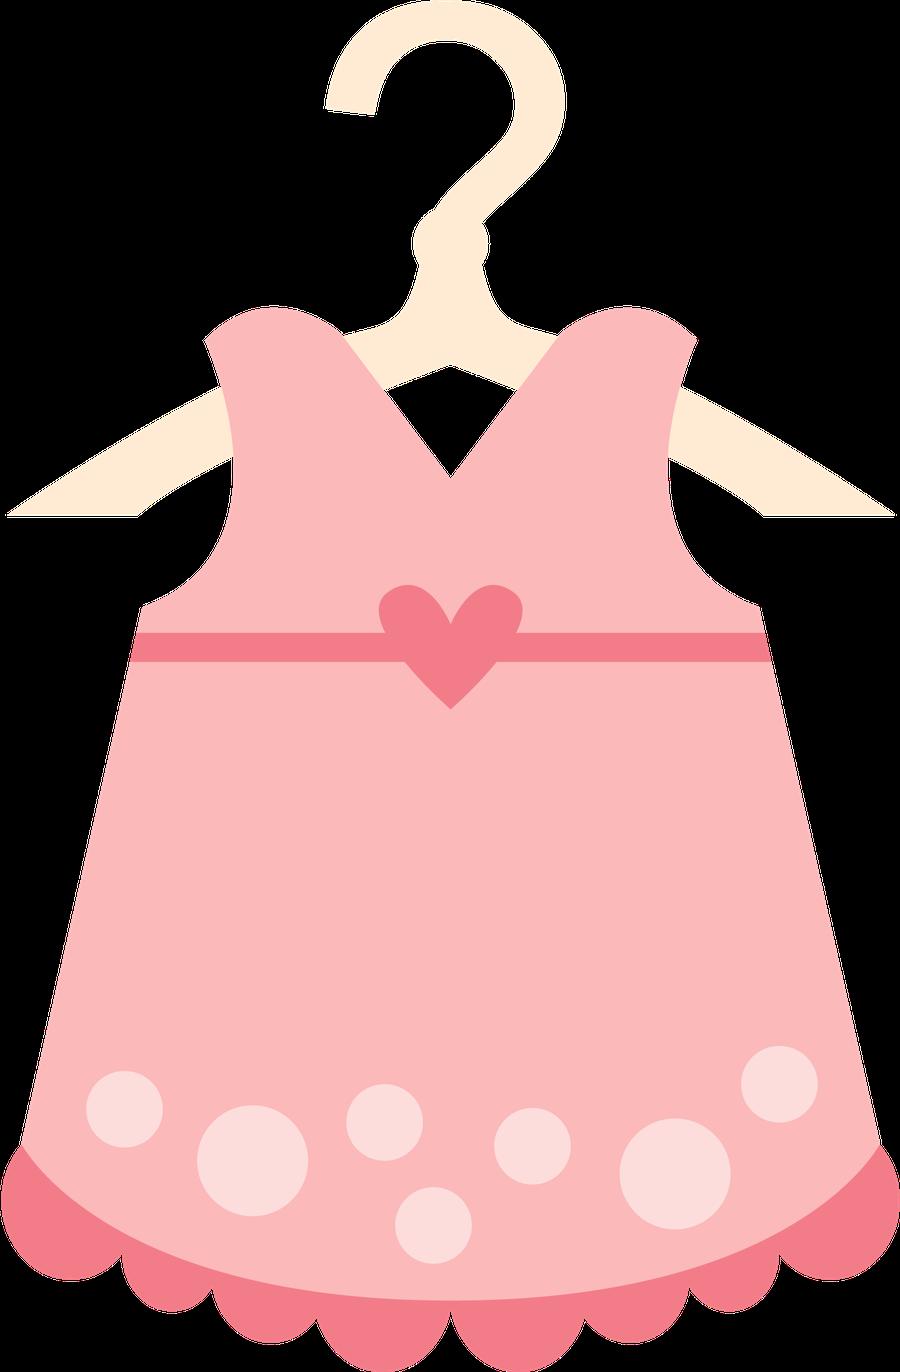 Pacifer clipart baby clothes. Beb menino e menina